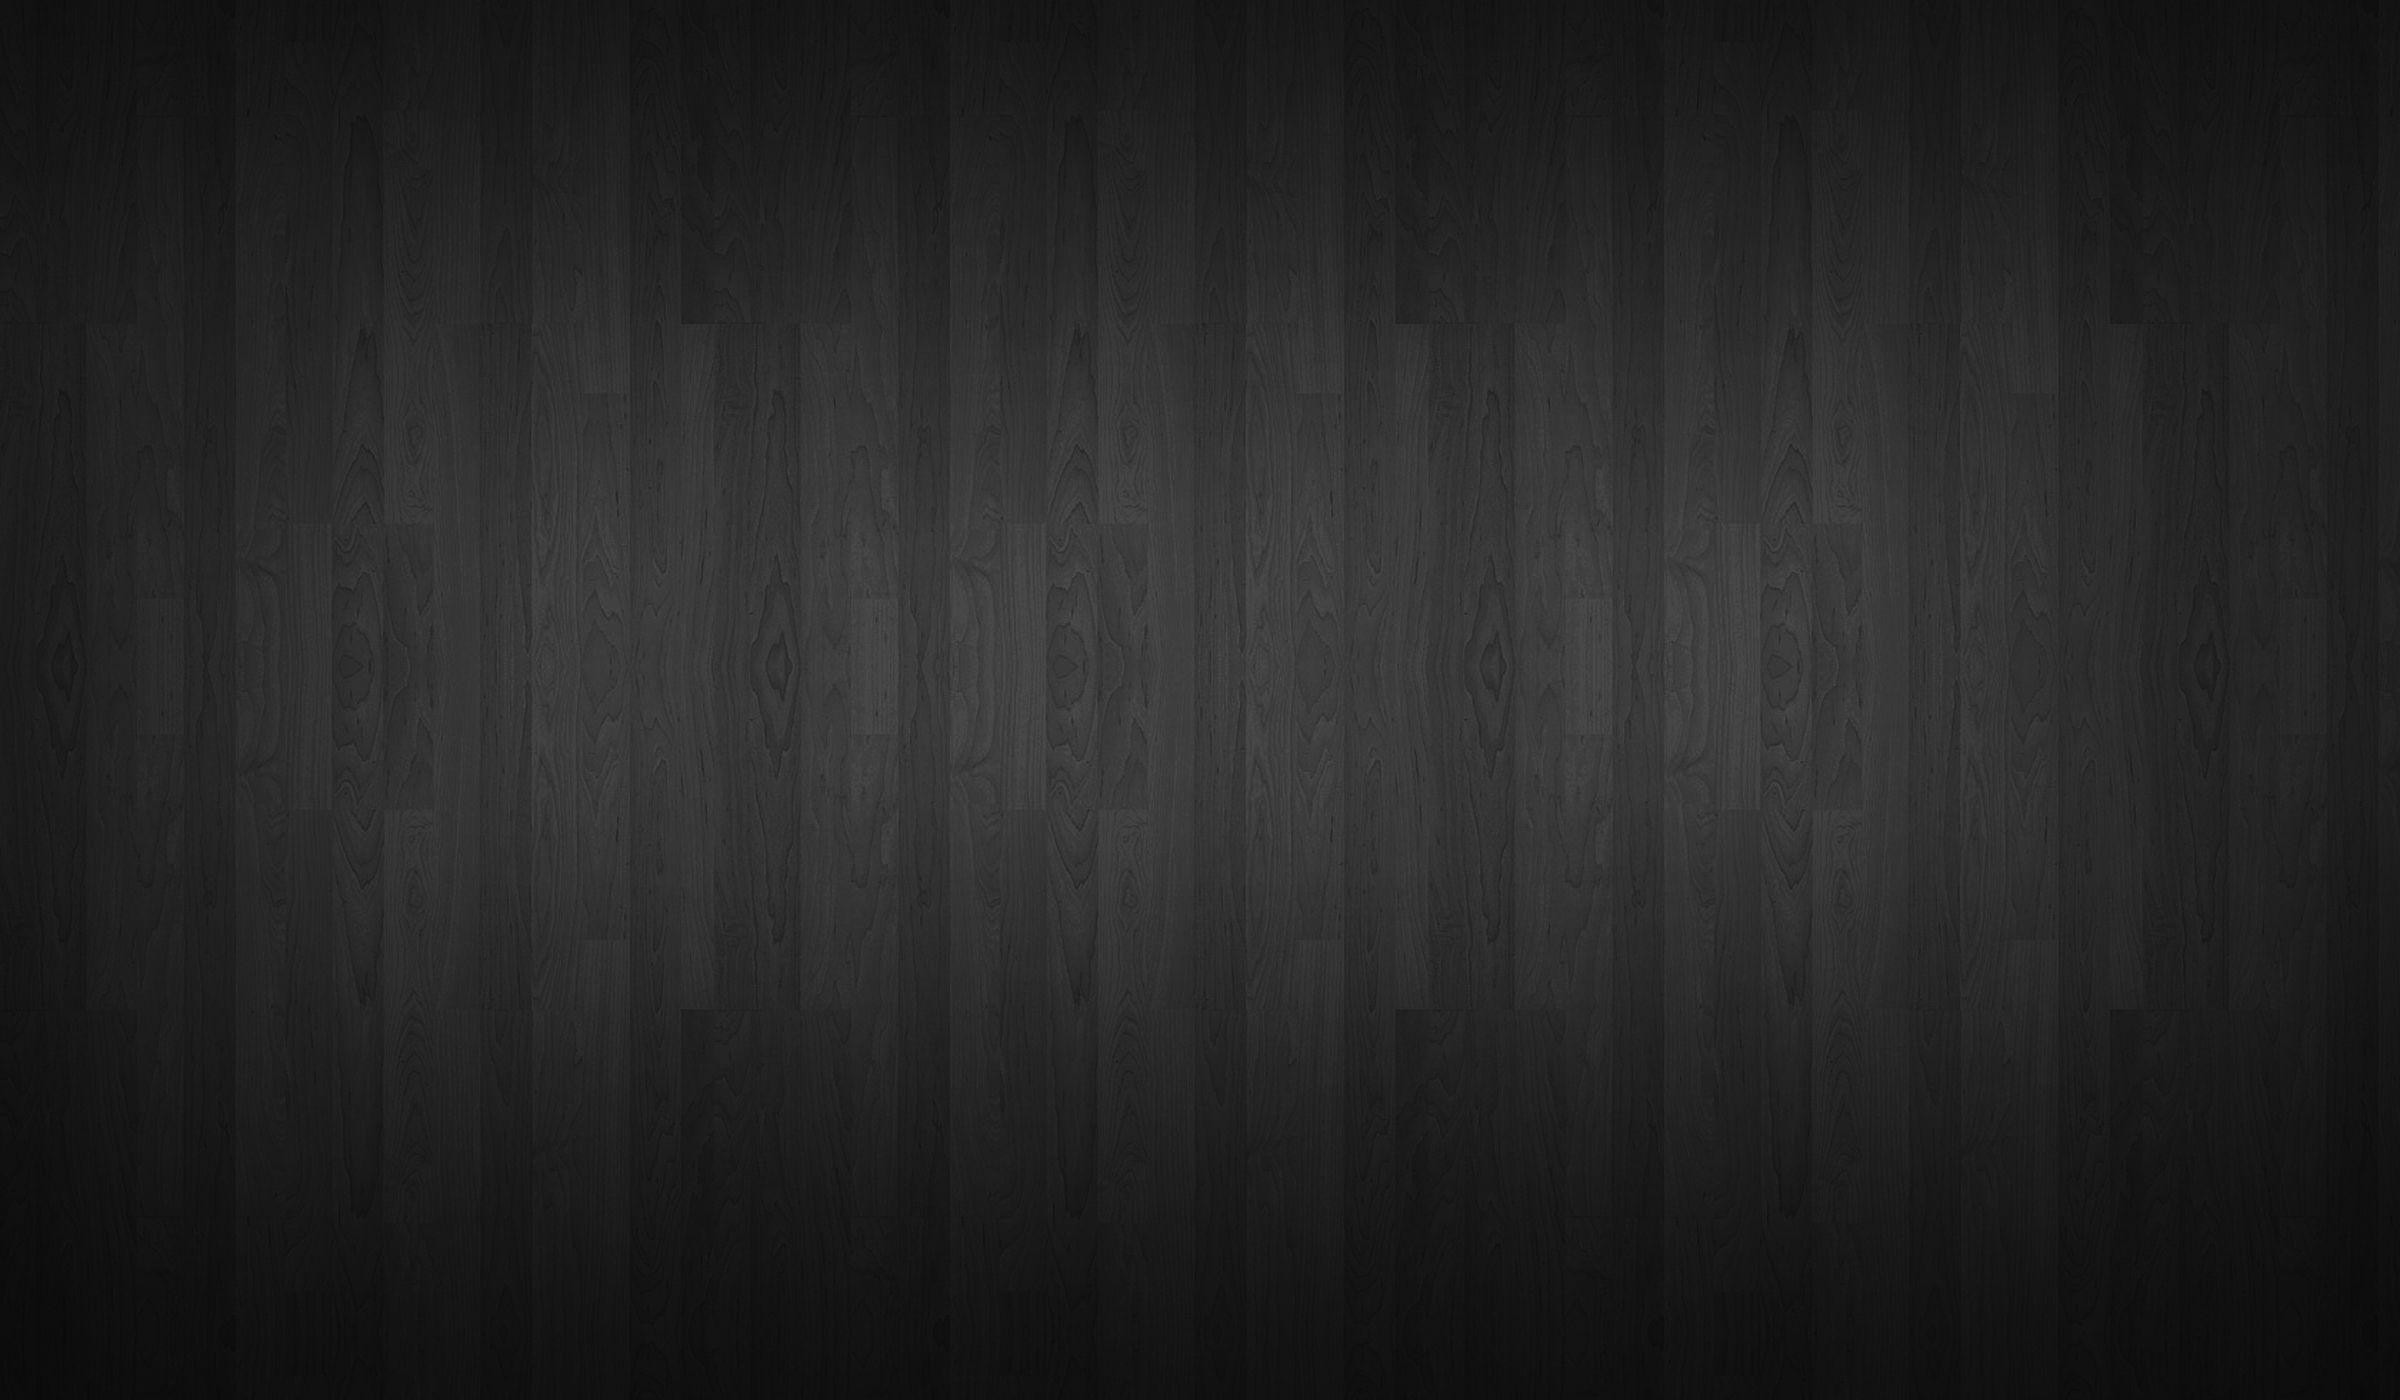 Wallpapers For > Black Gradient Wallpaper Iphone